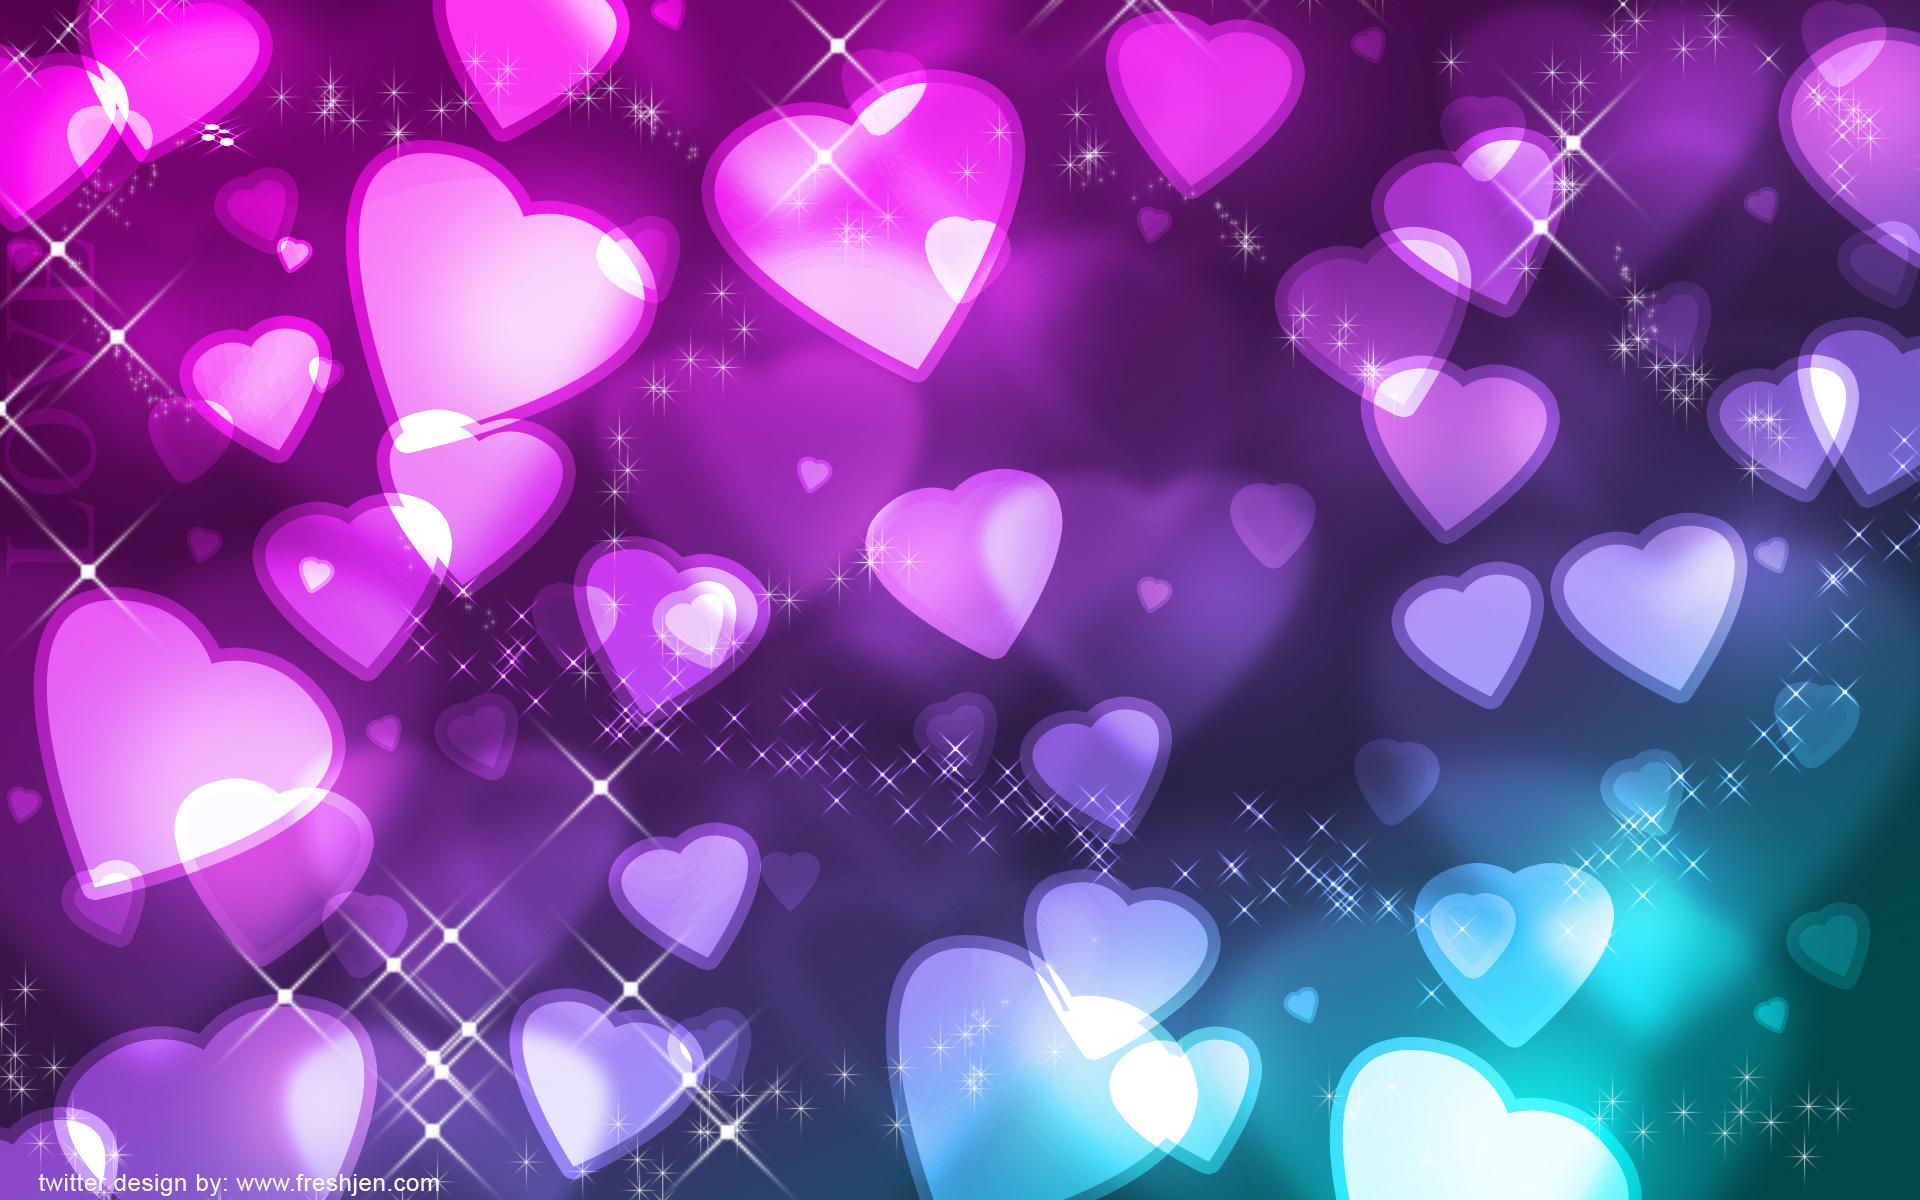 pretty heart designs wallpapers - photo #16